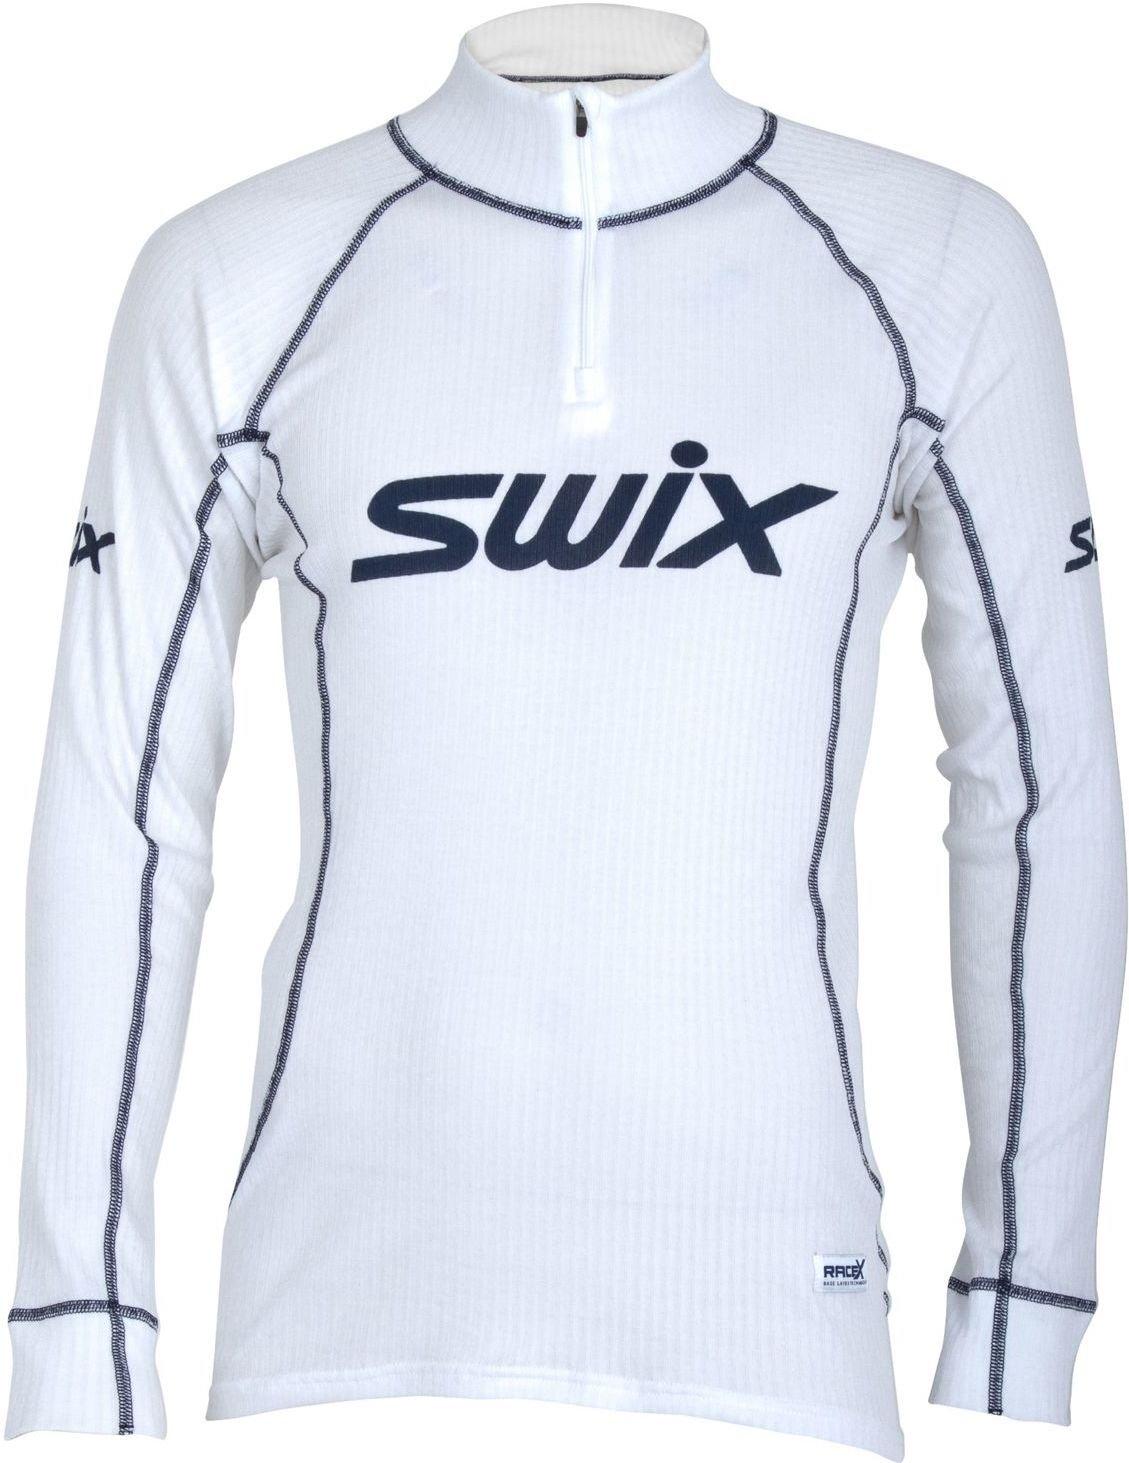 RaceX Warm Bodywear Half Zip